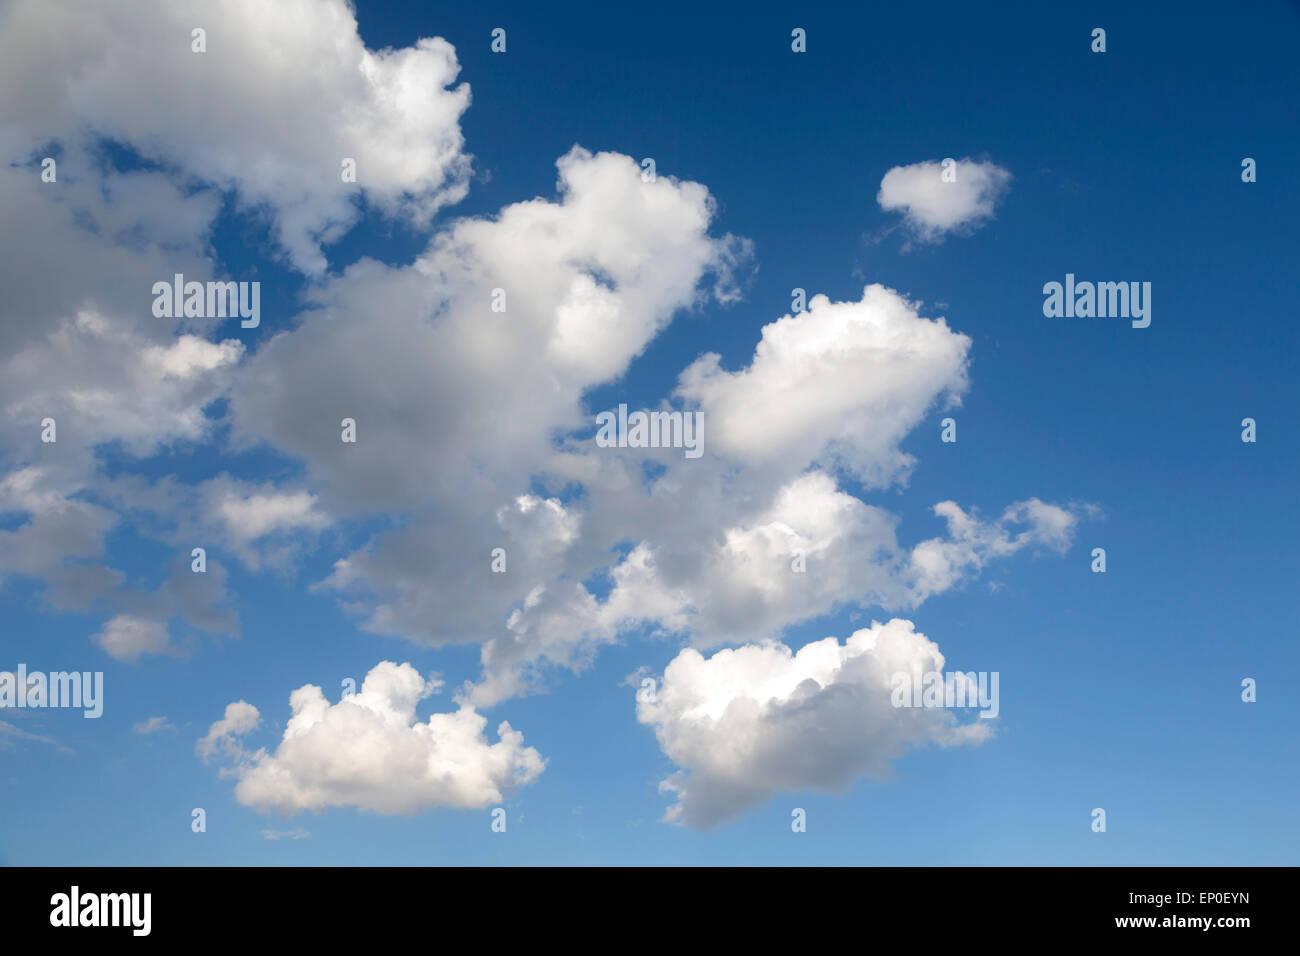 Cumulus-Wolken am blauen Himmel. Stockbild